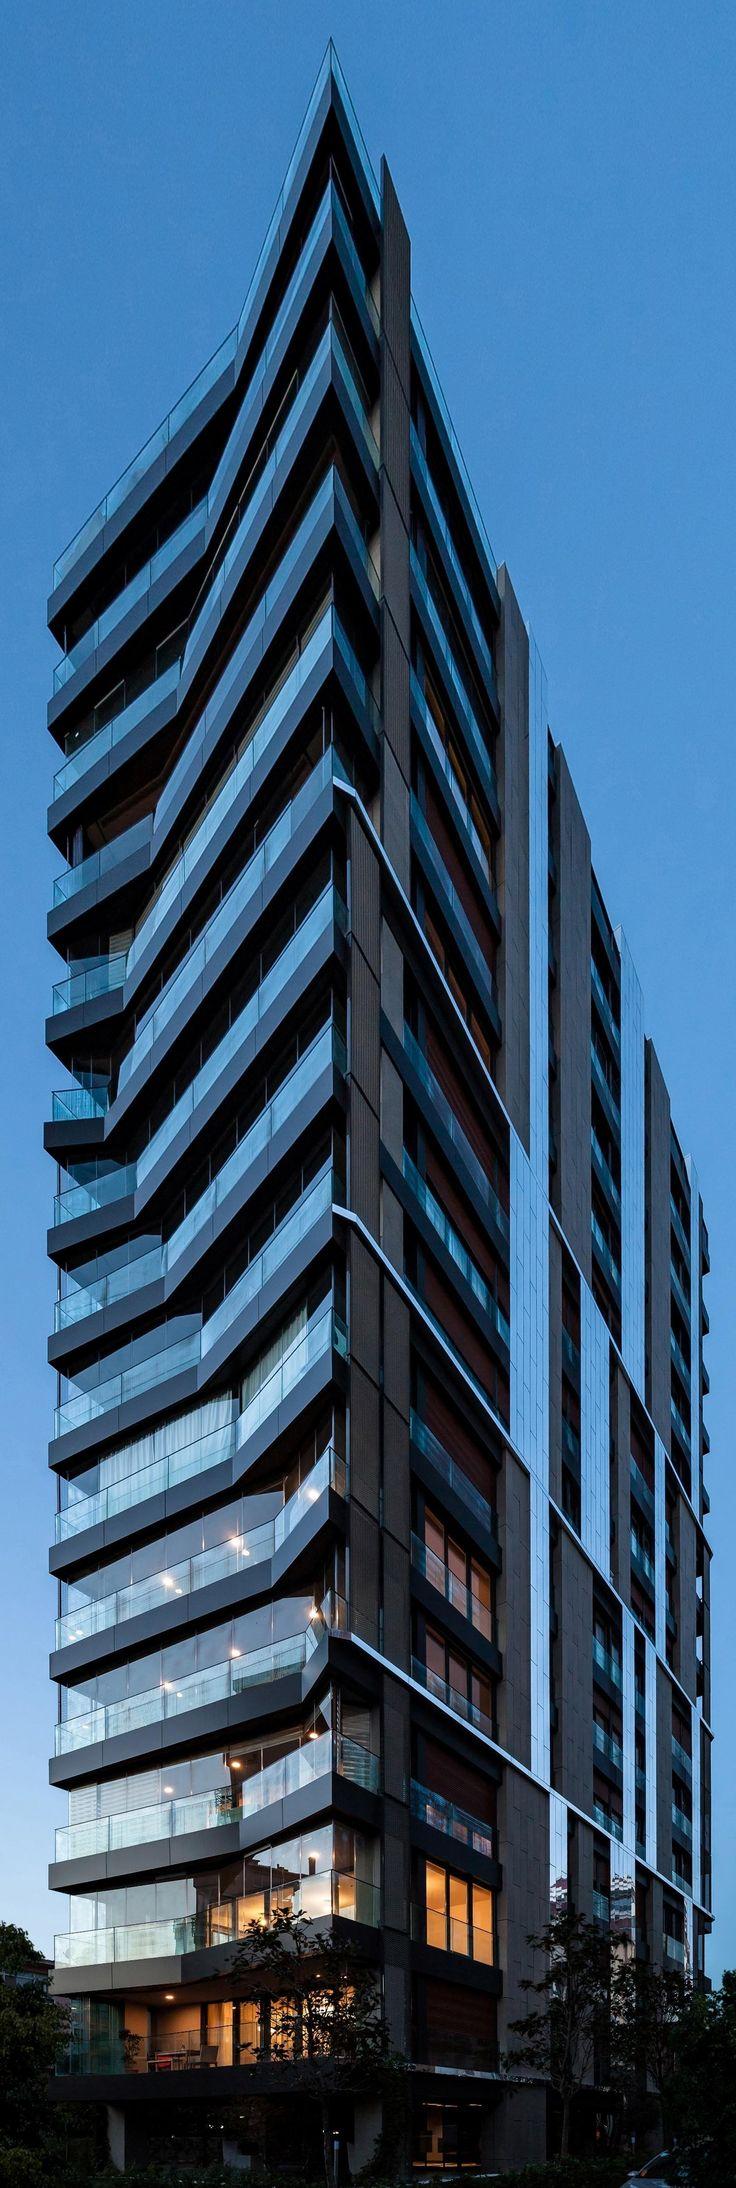 Arkvista Residence by Arkizon Architects http://www.archello.com/en/project/arkvista-residence